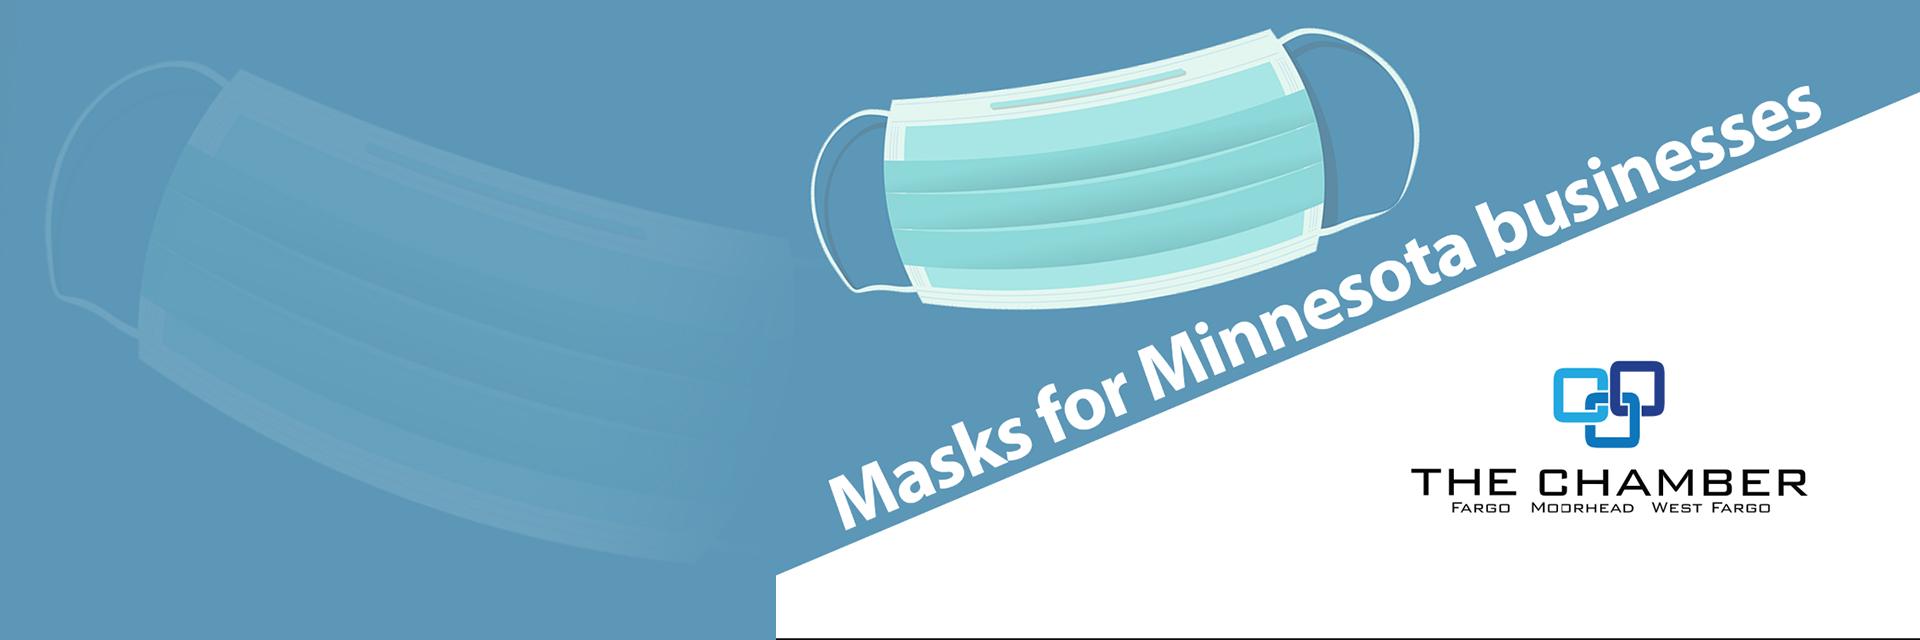 Mask-up-mn-2.jpg